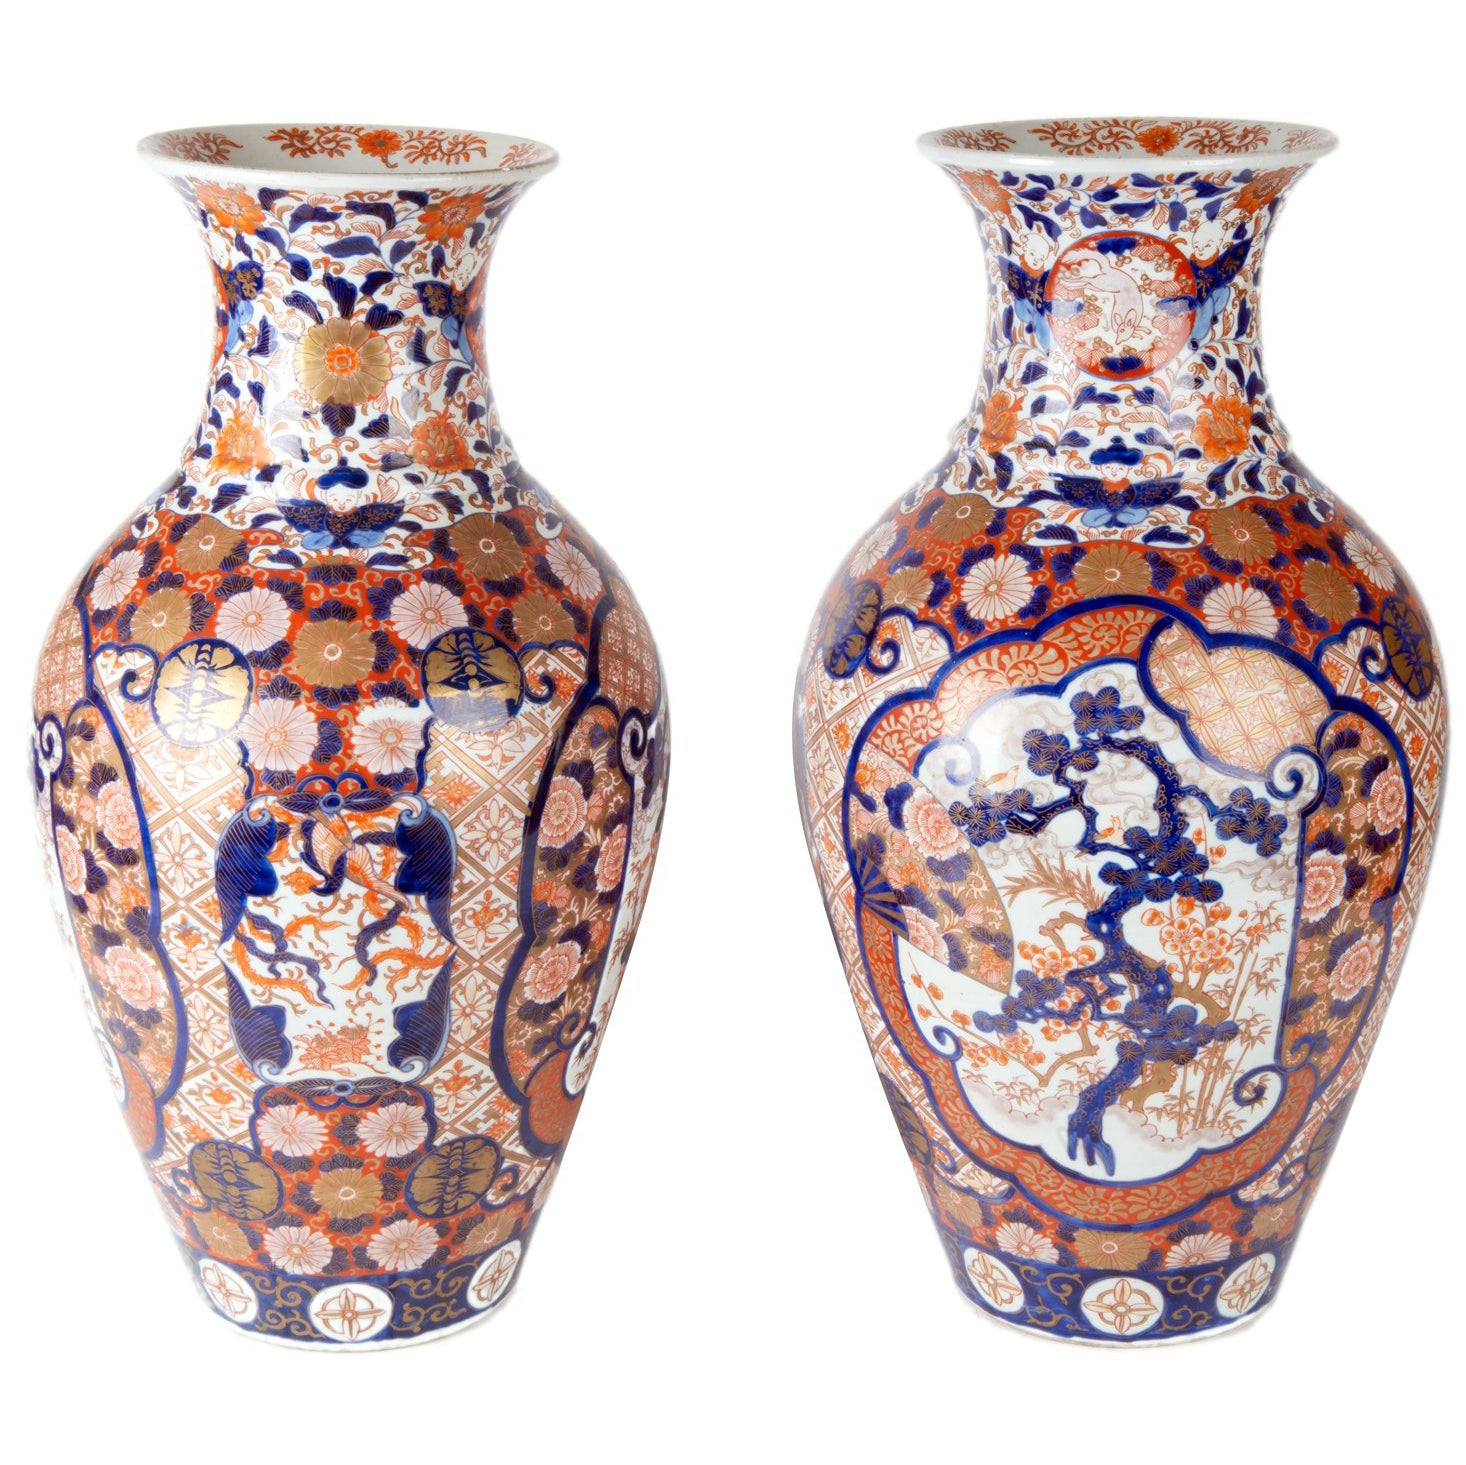 Pair of 19th Century Japanese Imari Vases